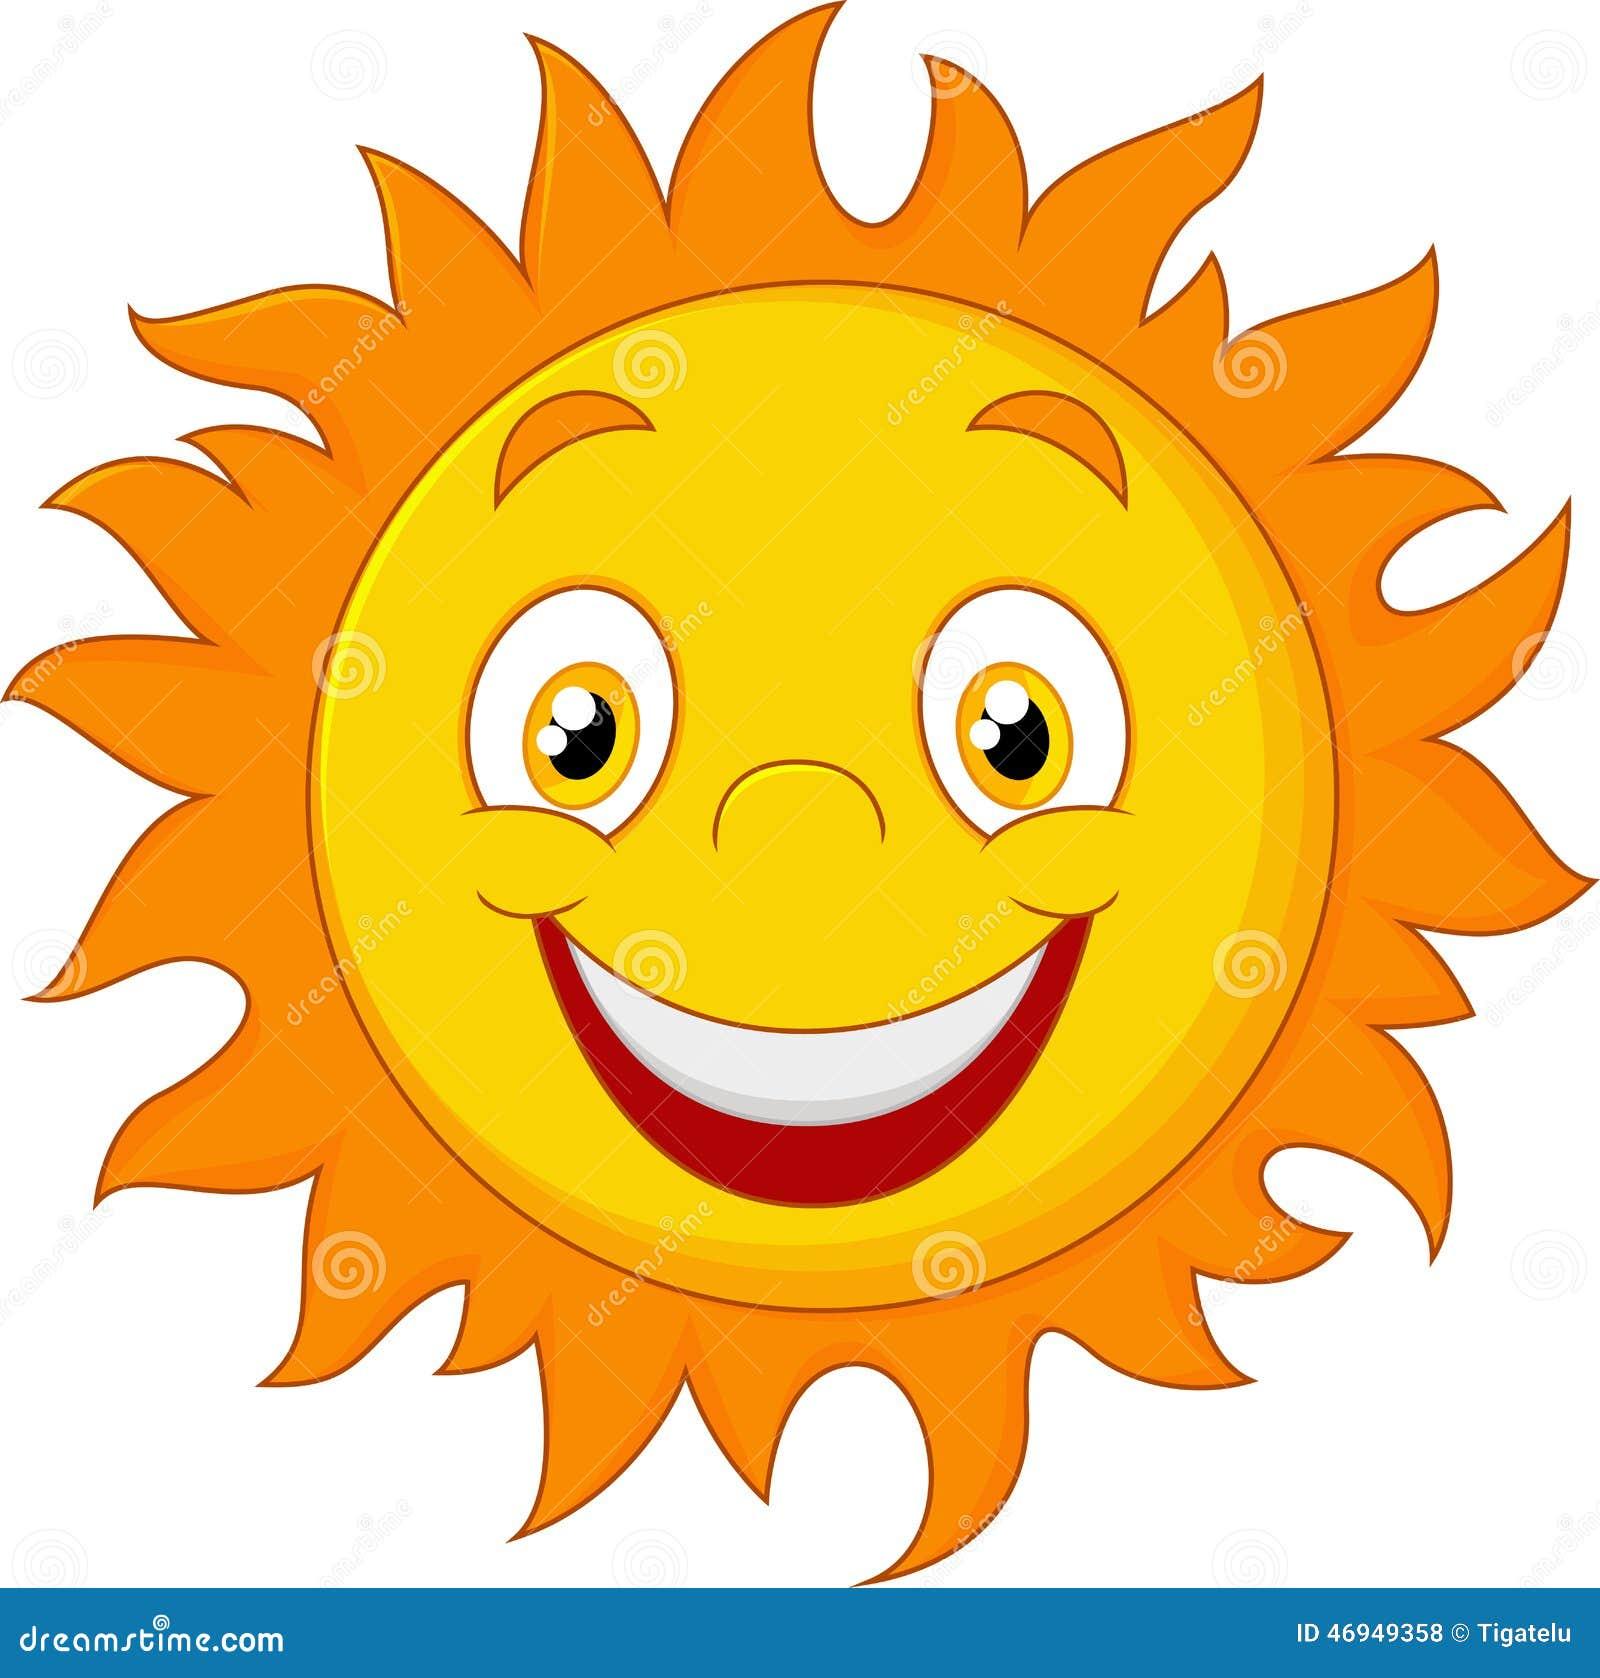 happy cartoon sun stock vector illustration of glow 46949358 rh dreamstime com cartoon pictures of the sunshine cartoon pictures of the sun